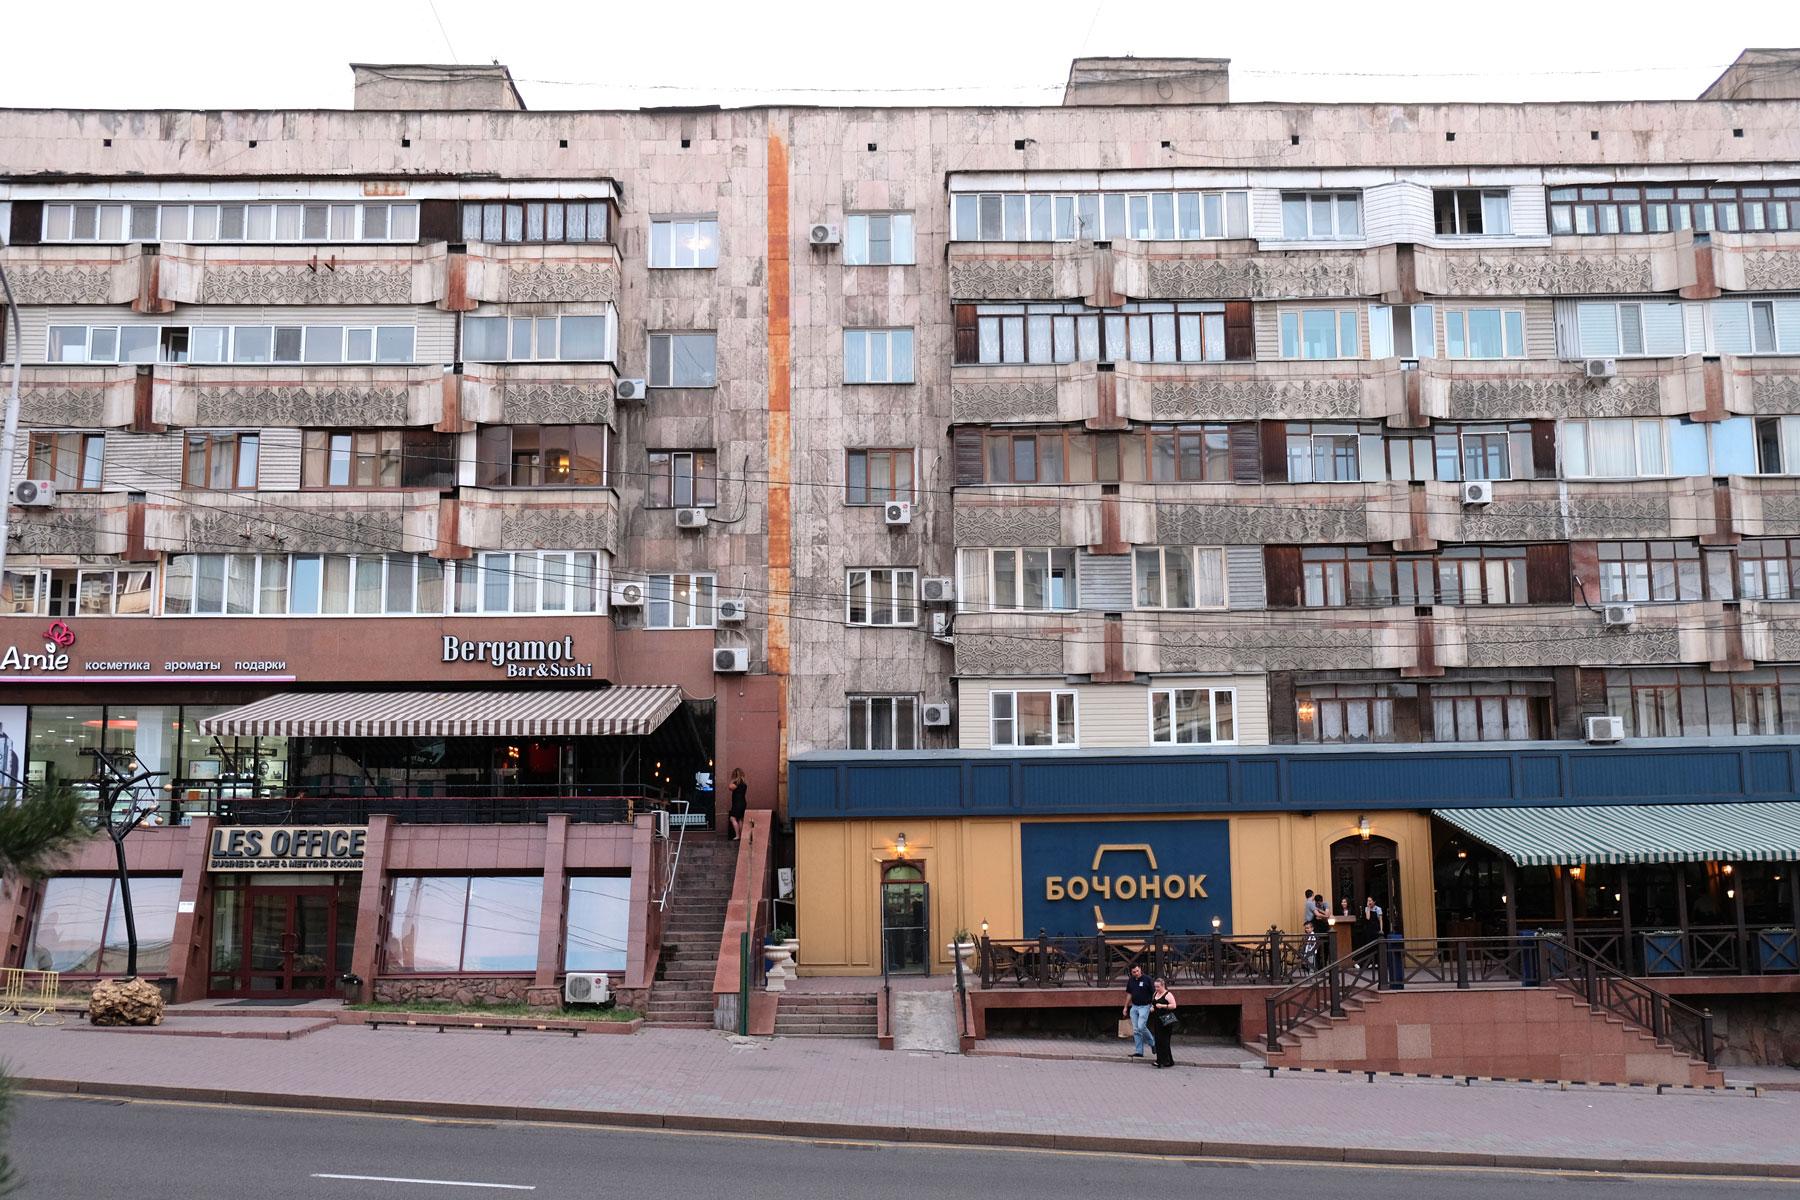 Wohnhäuser in Almaty in Kasachstan.